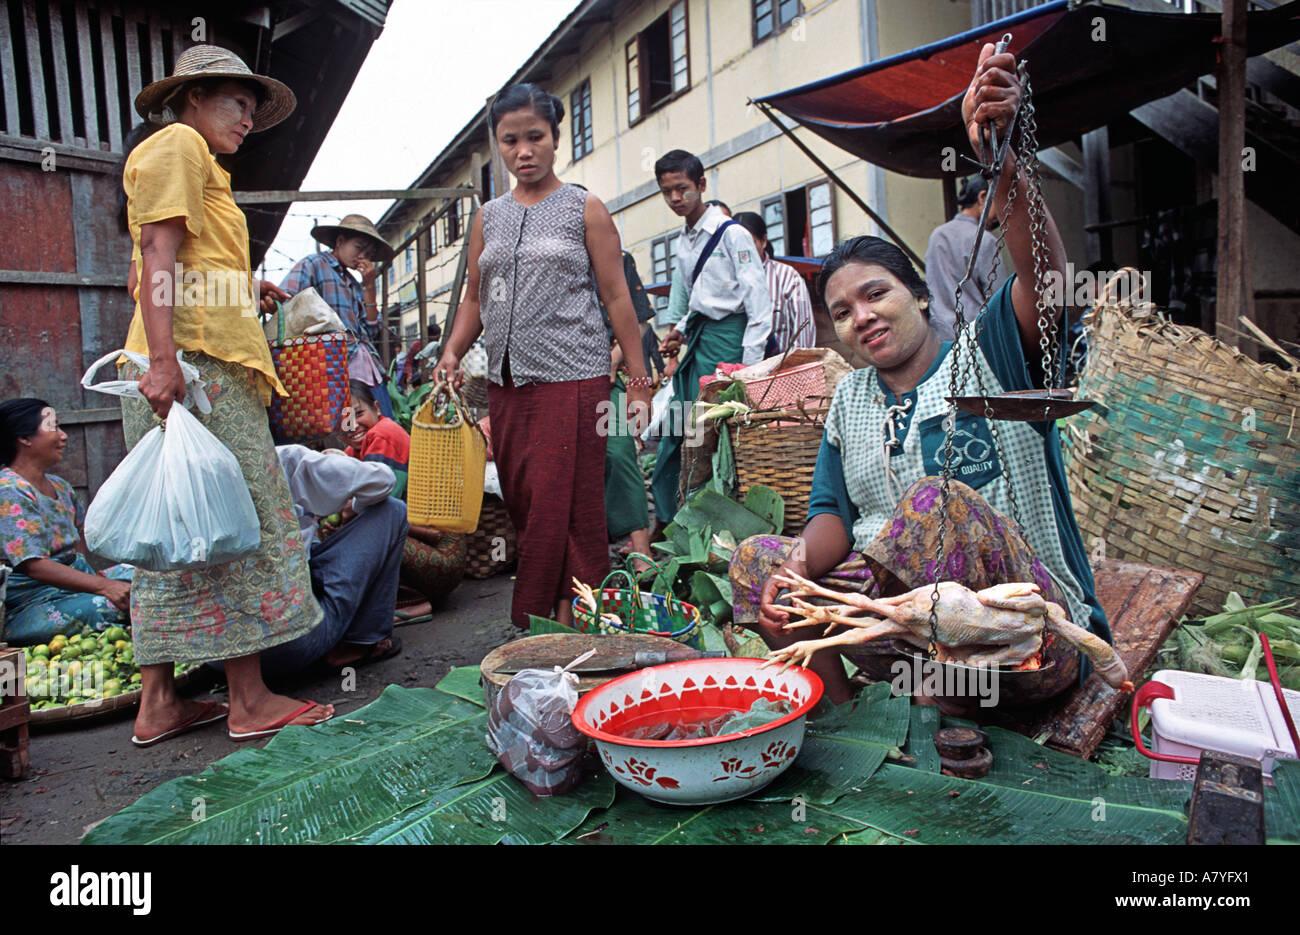 Poultry vendor holding up her wares Pyin U Lwin market near Mandalay Burma MYANMAR - Stock Image